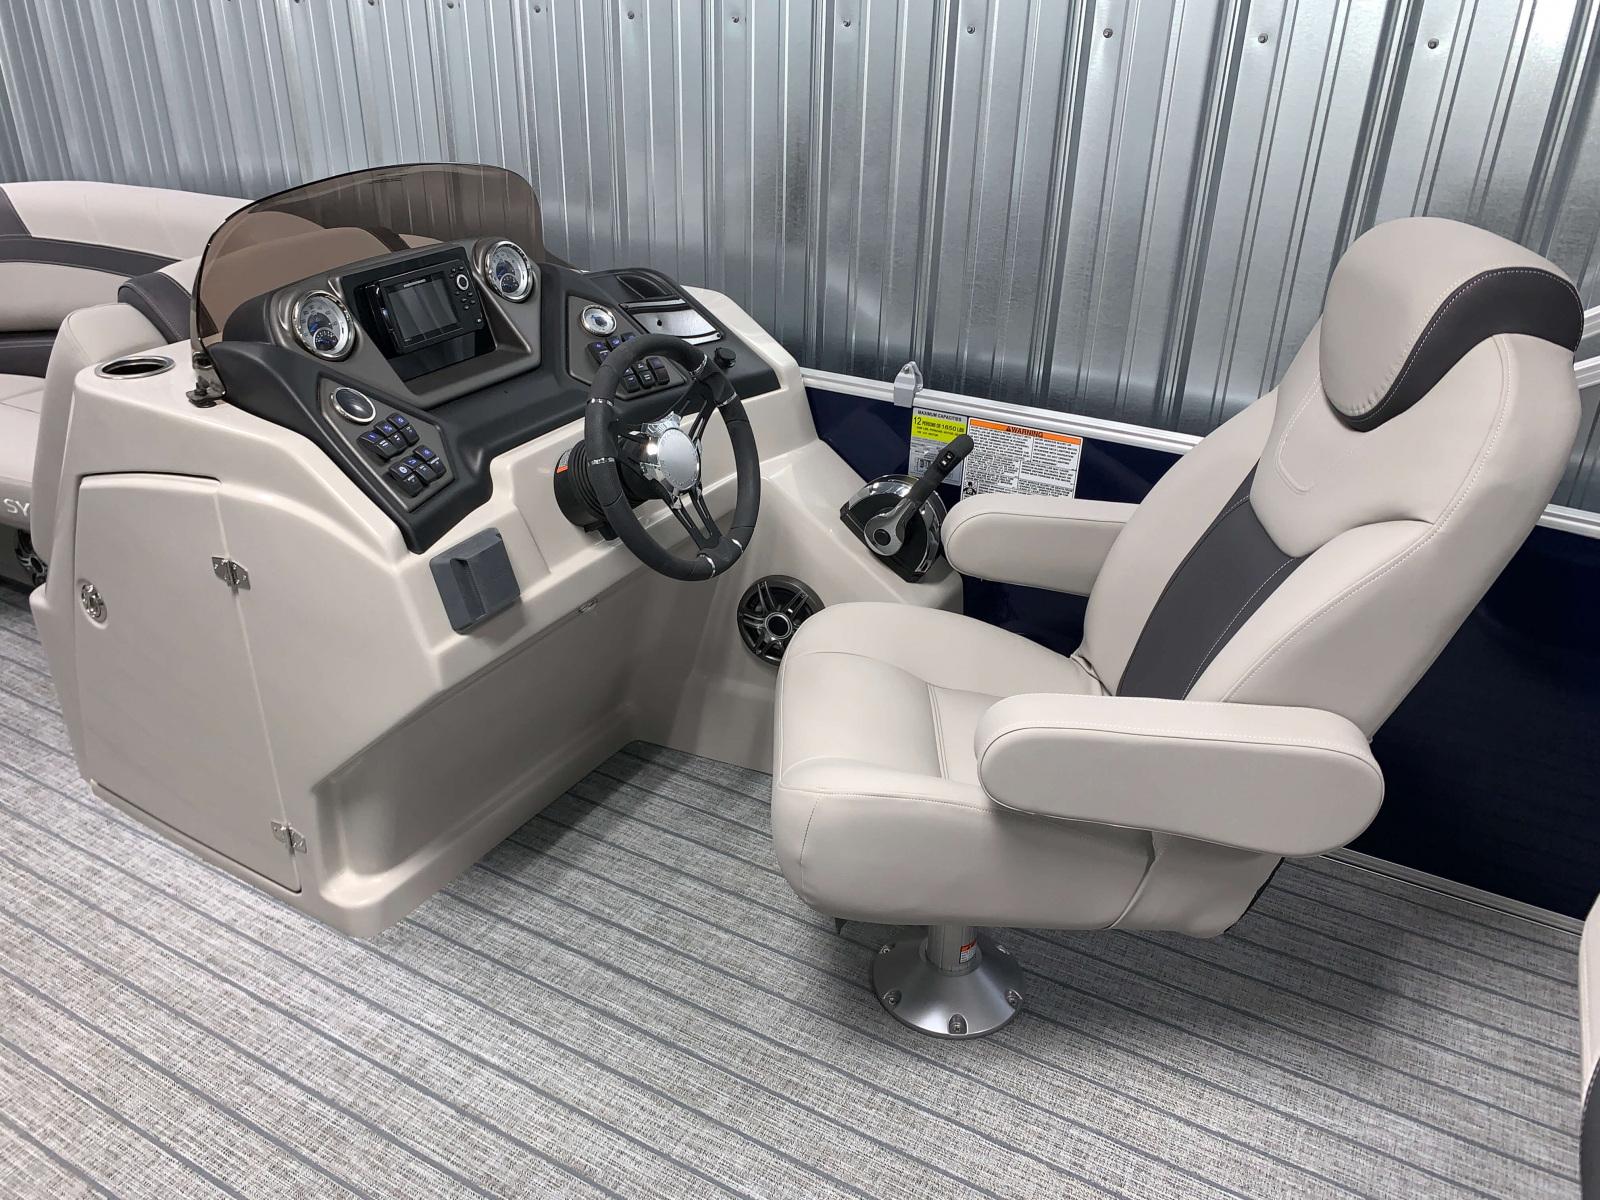 Helm of the 2022 Sylvan L3 DLZ Pontoon Boat